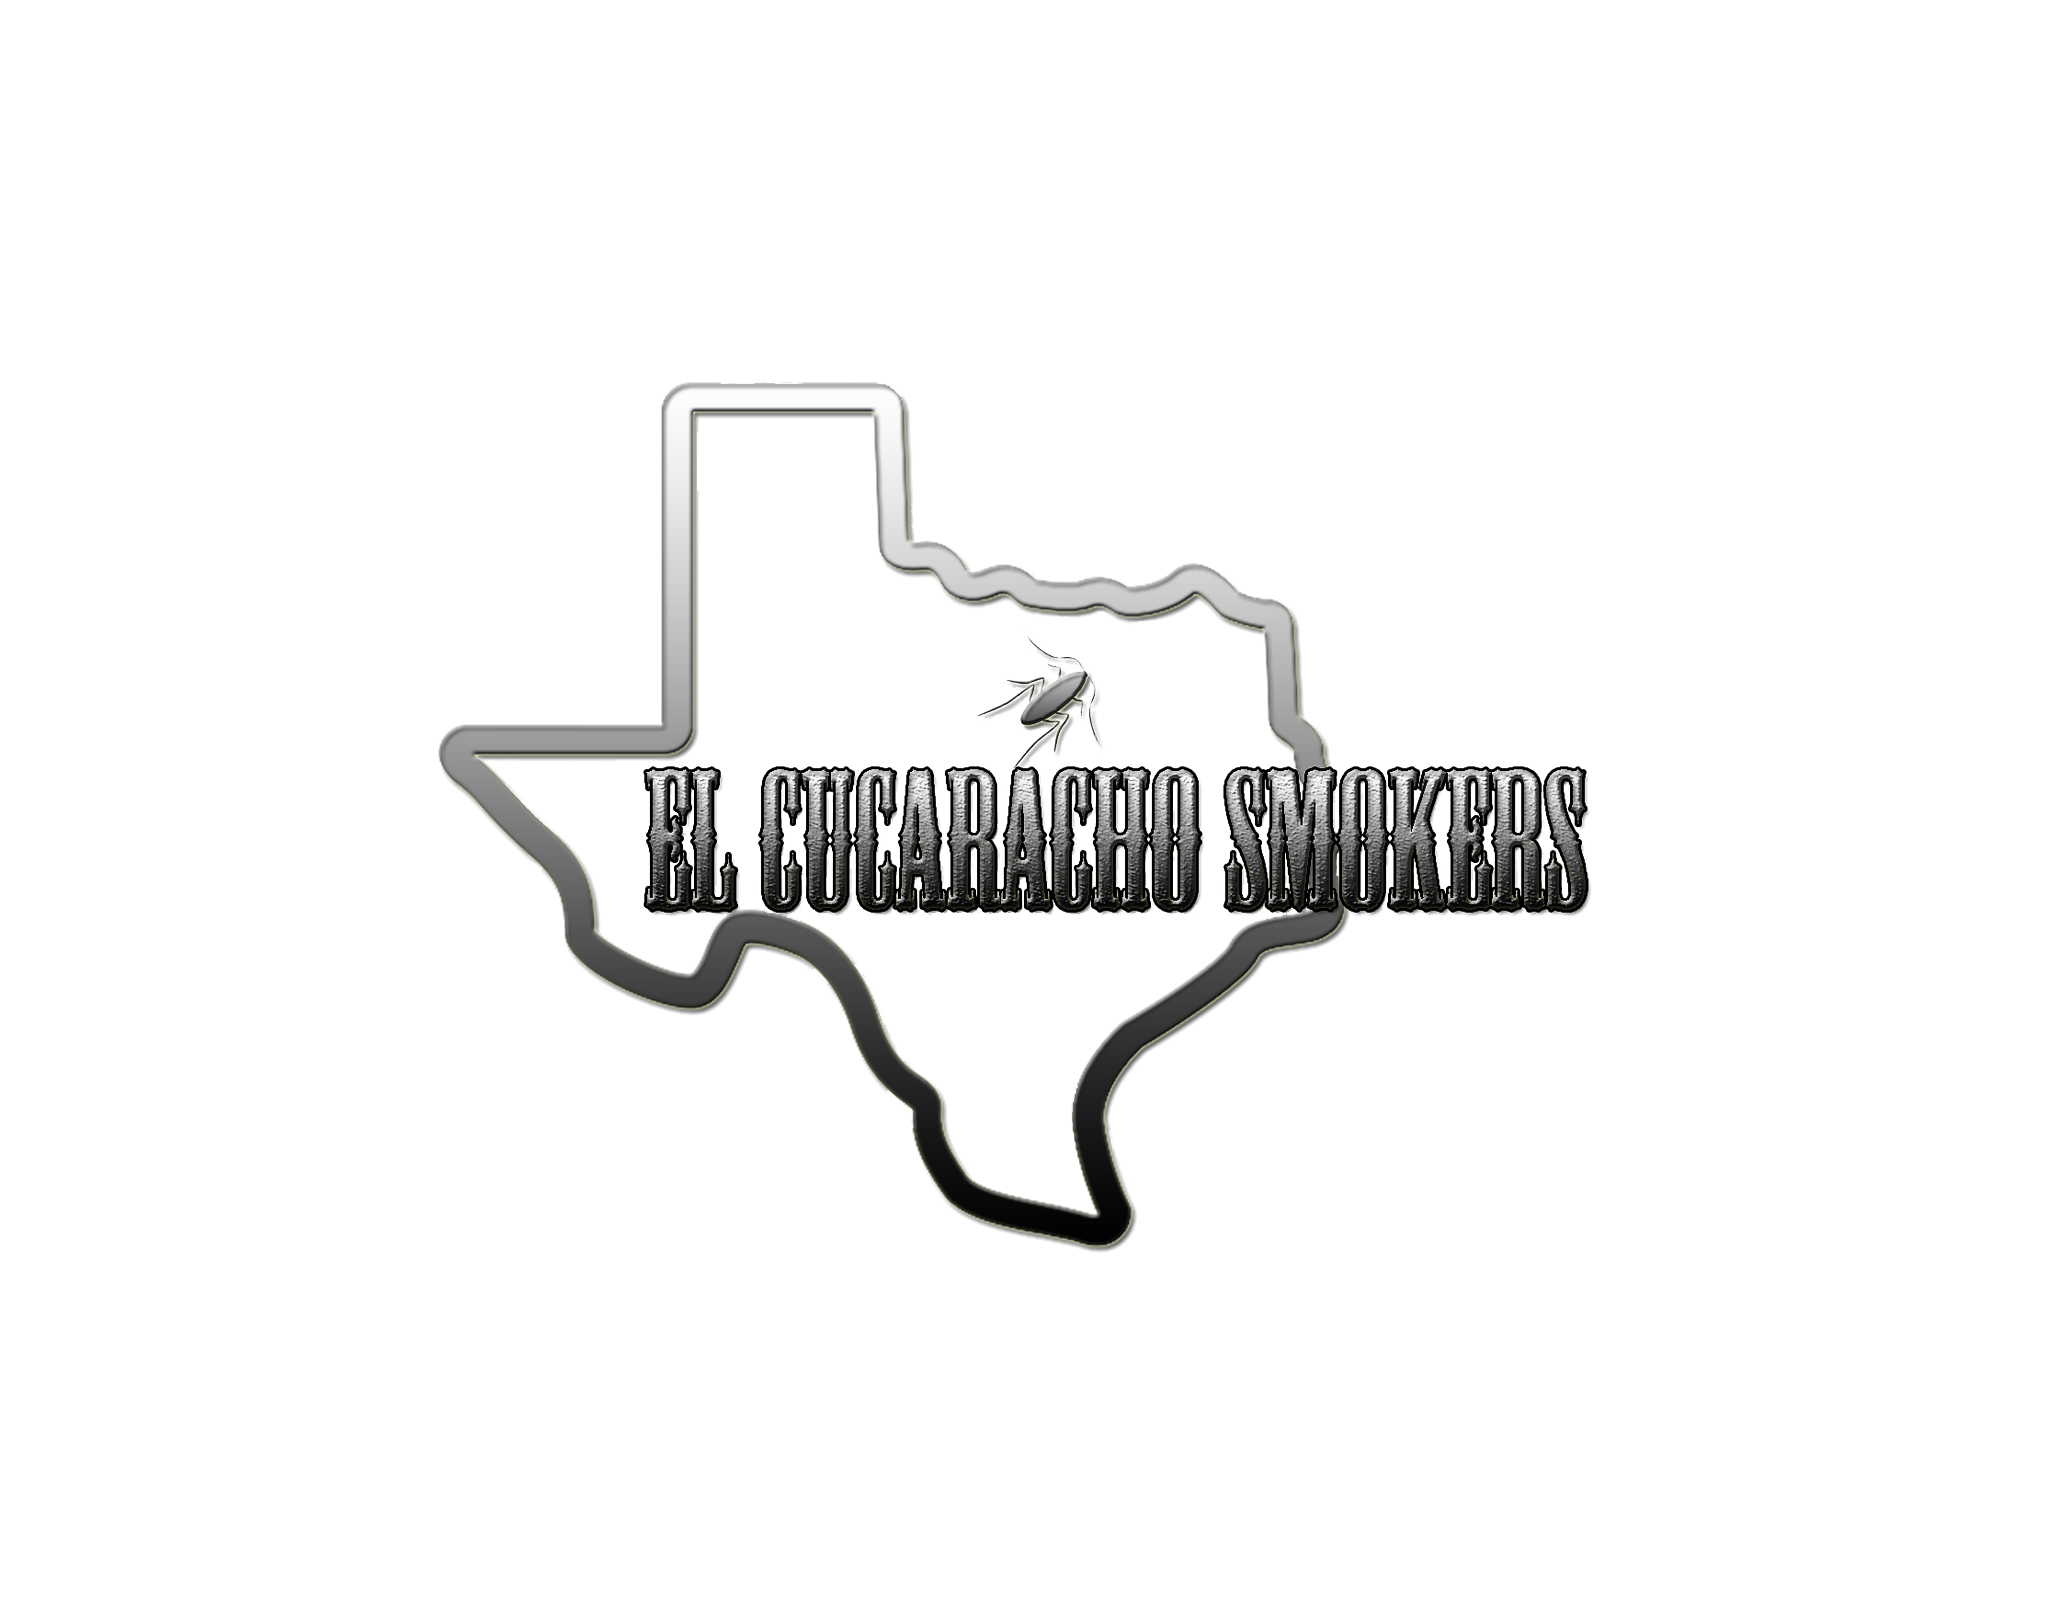 ElCucarachoSmokerstransparentlogo-Logo.png